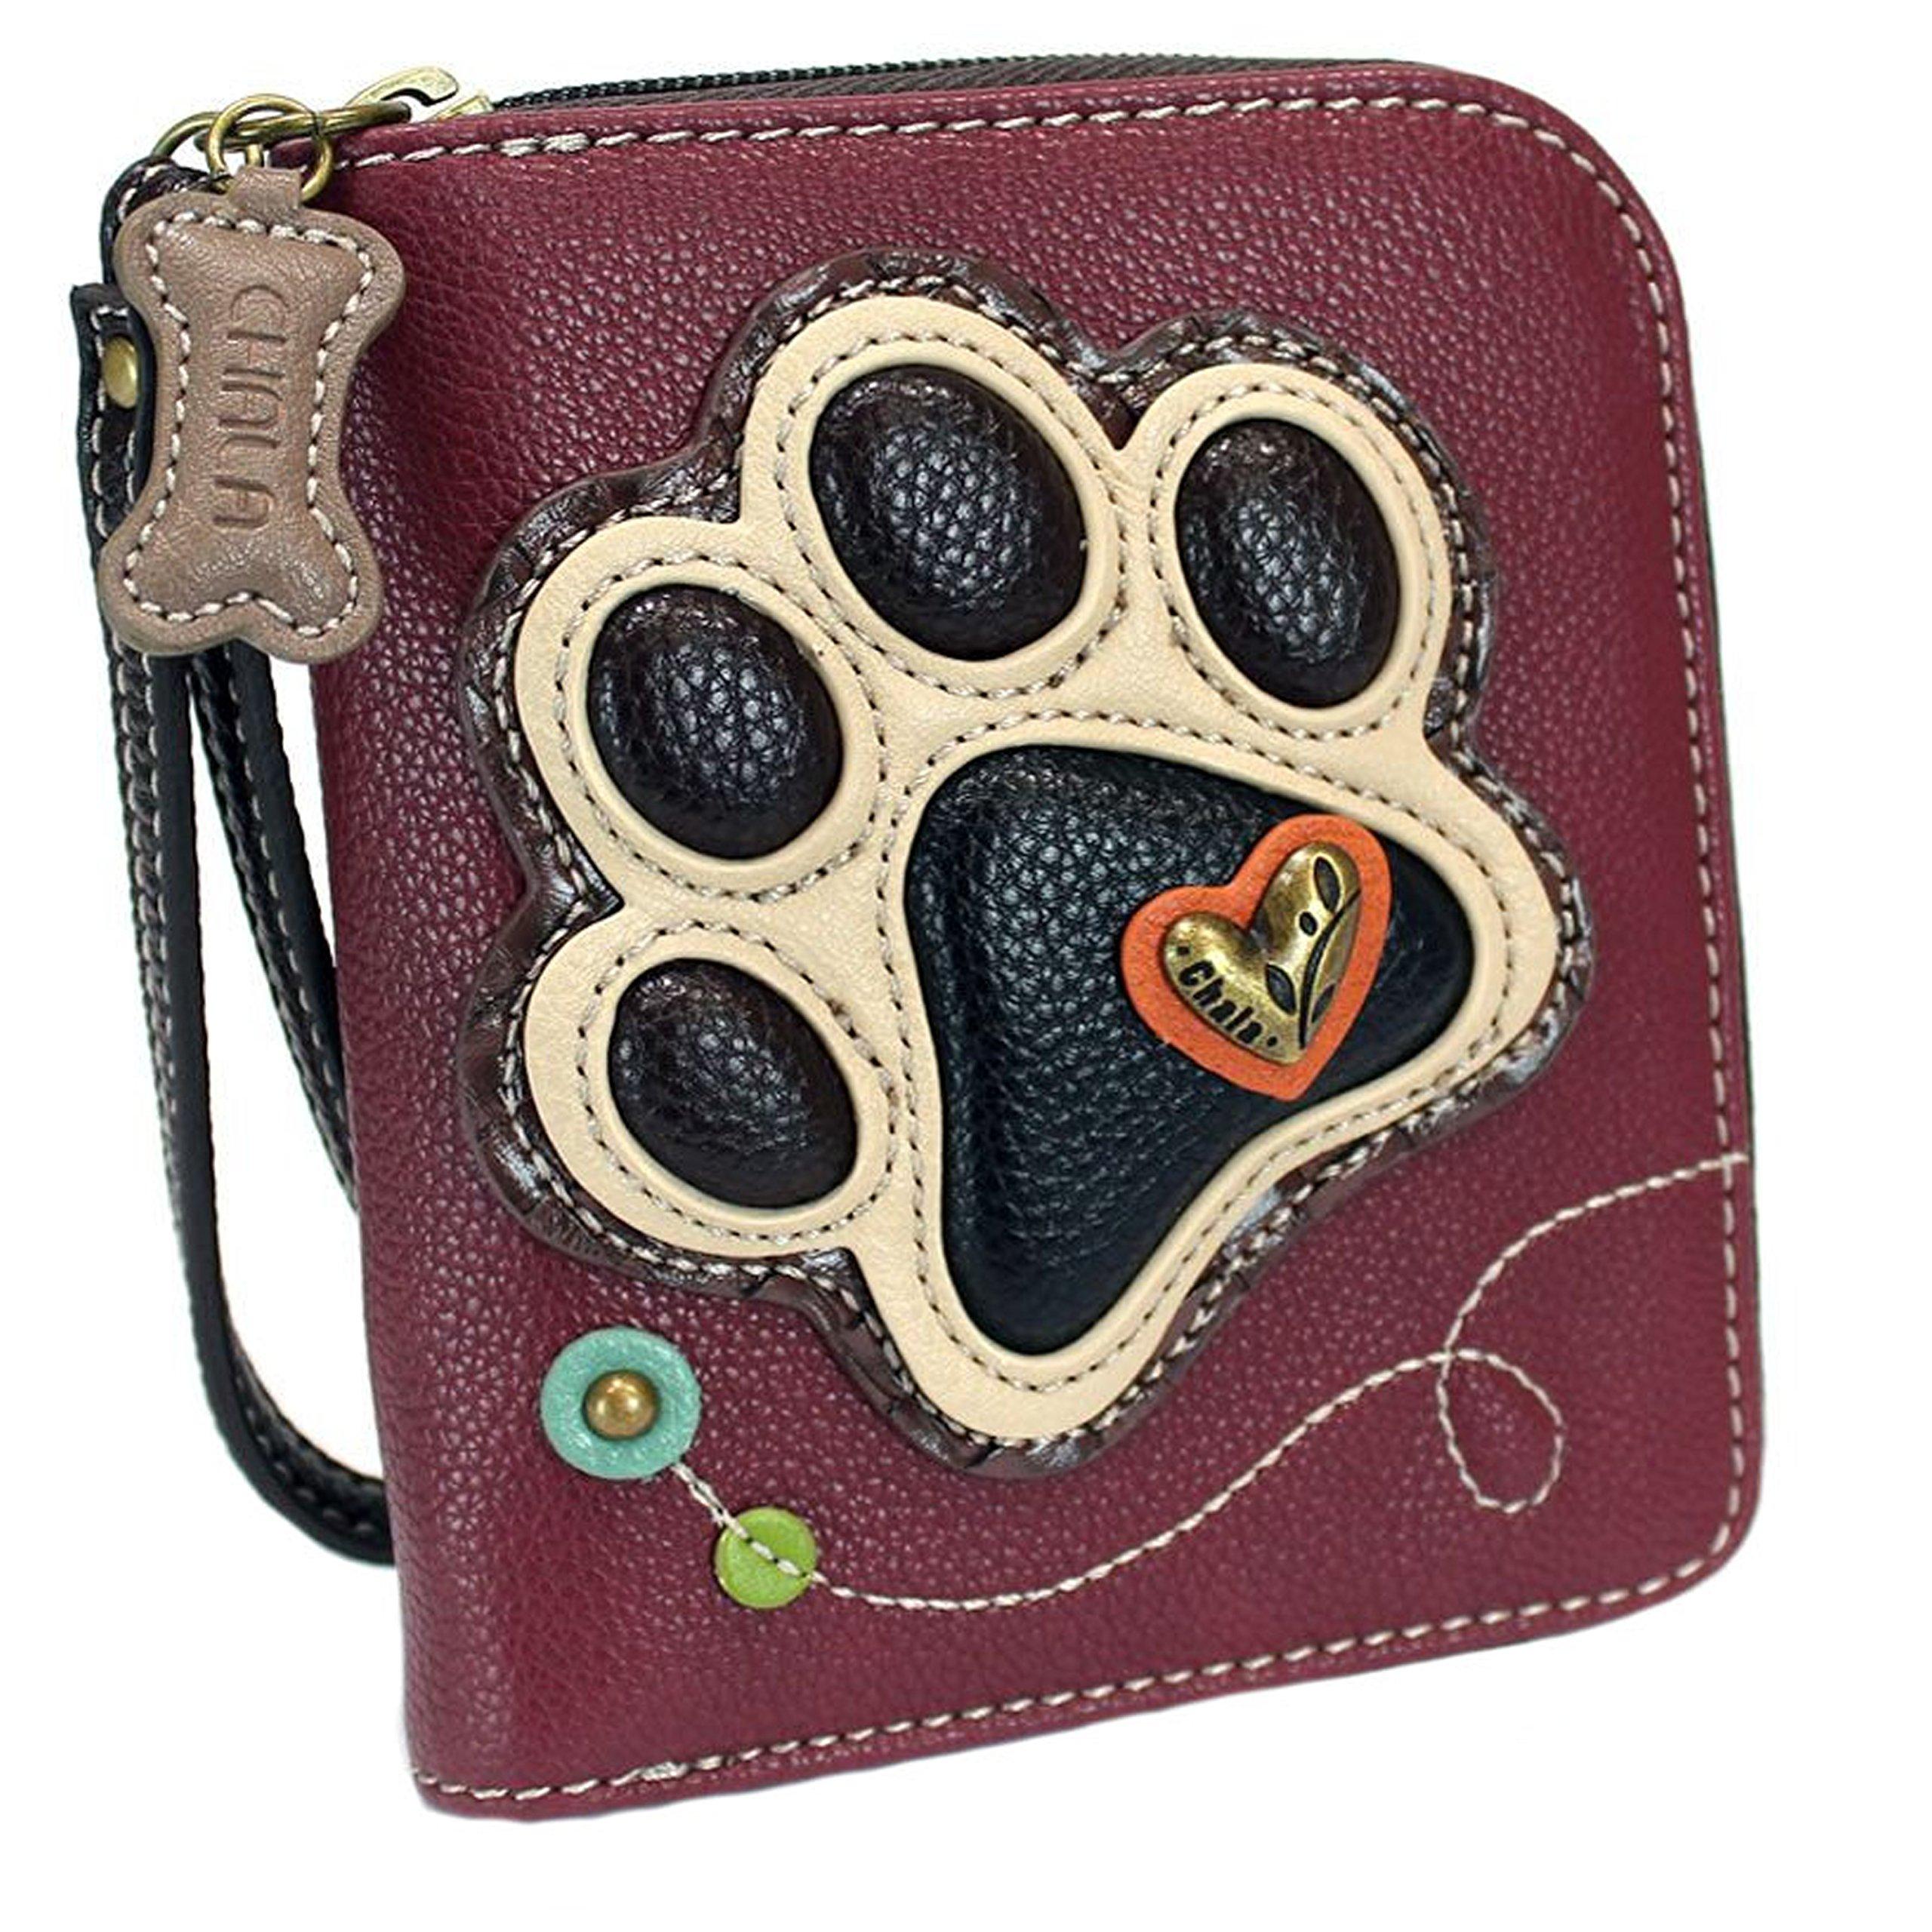 Chala Ivory Paw Print Zip-Around Wristlet Wallet, Dog Mom Gift by Chala Group (Image #1)